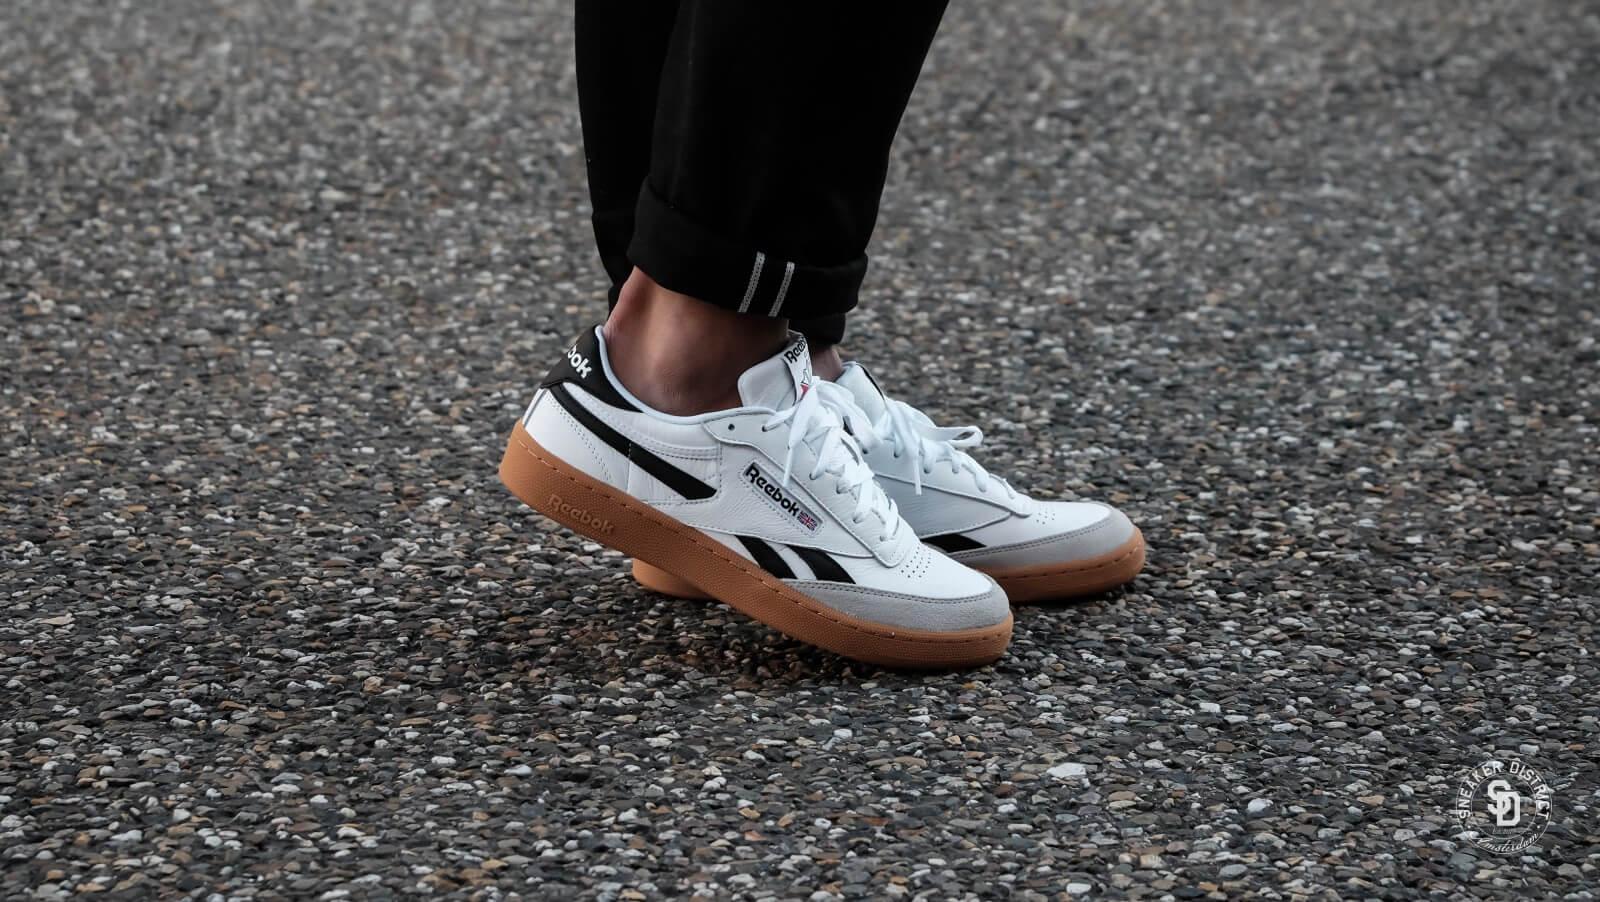 Reebok Chaussures Revenge Plus Gum Classics White